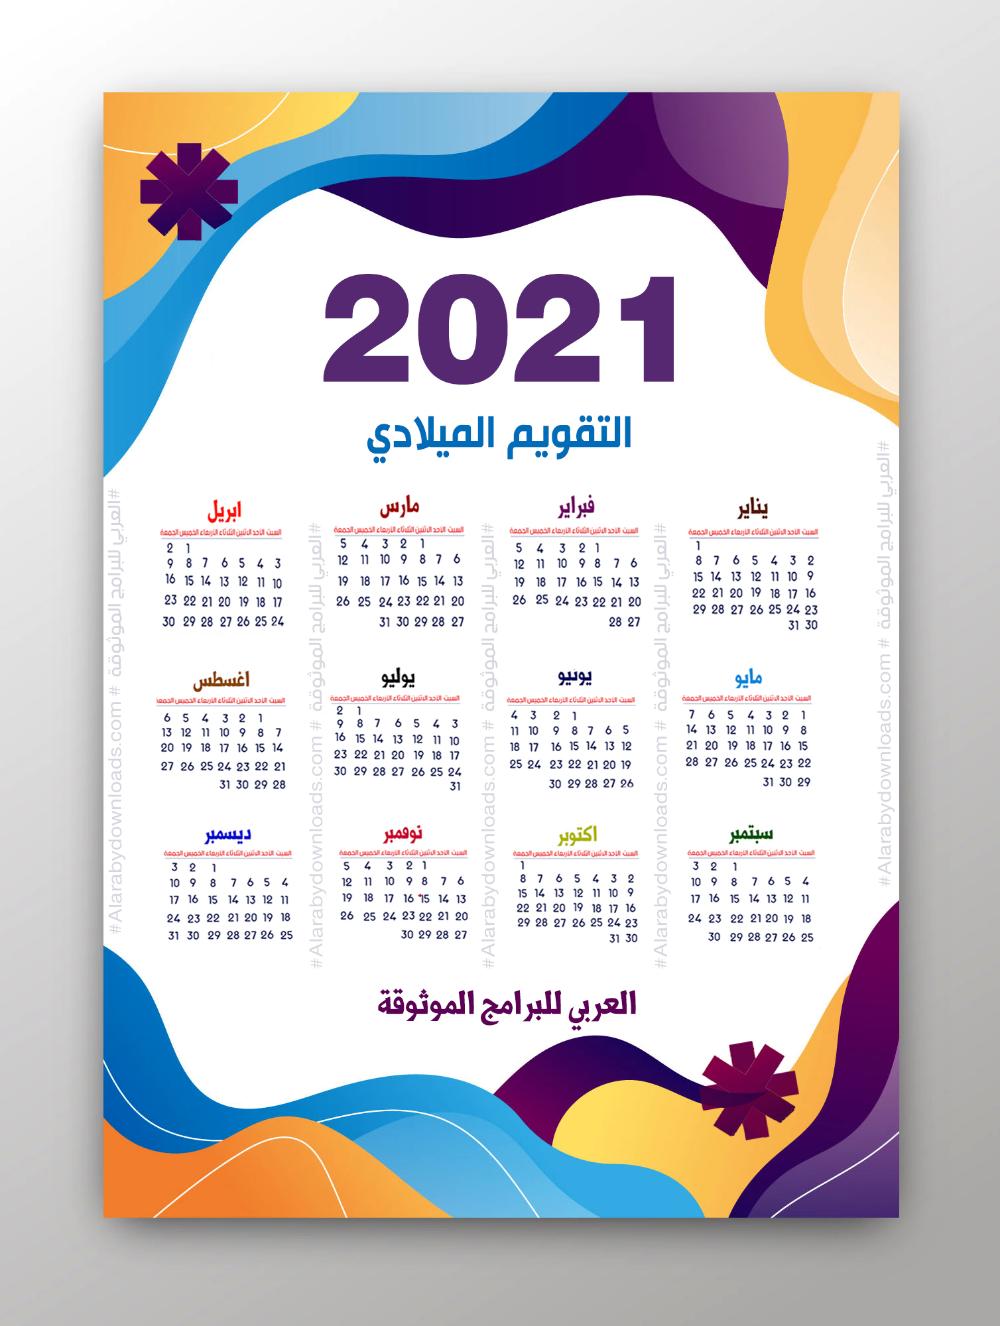 تحميل التقويم الميلادي 2021 عربي صورة تحميل تقويم 2021 برابط مباشر تقويم 2021 Pdf Daily Planner Printable Calendar Printable Planner